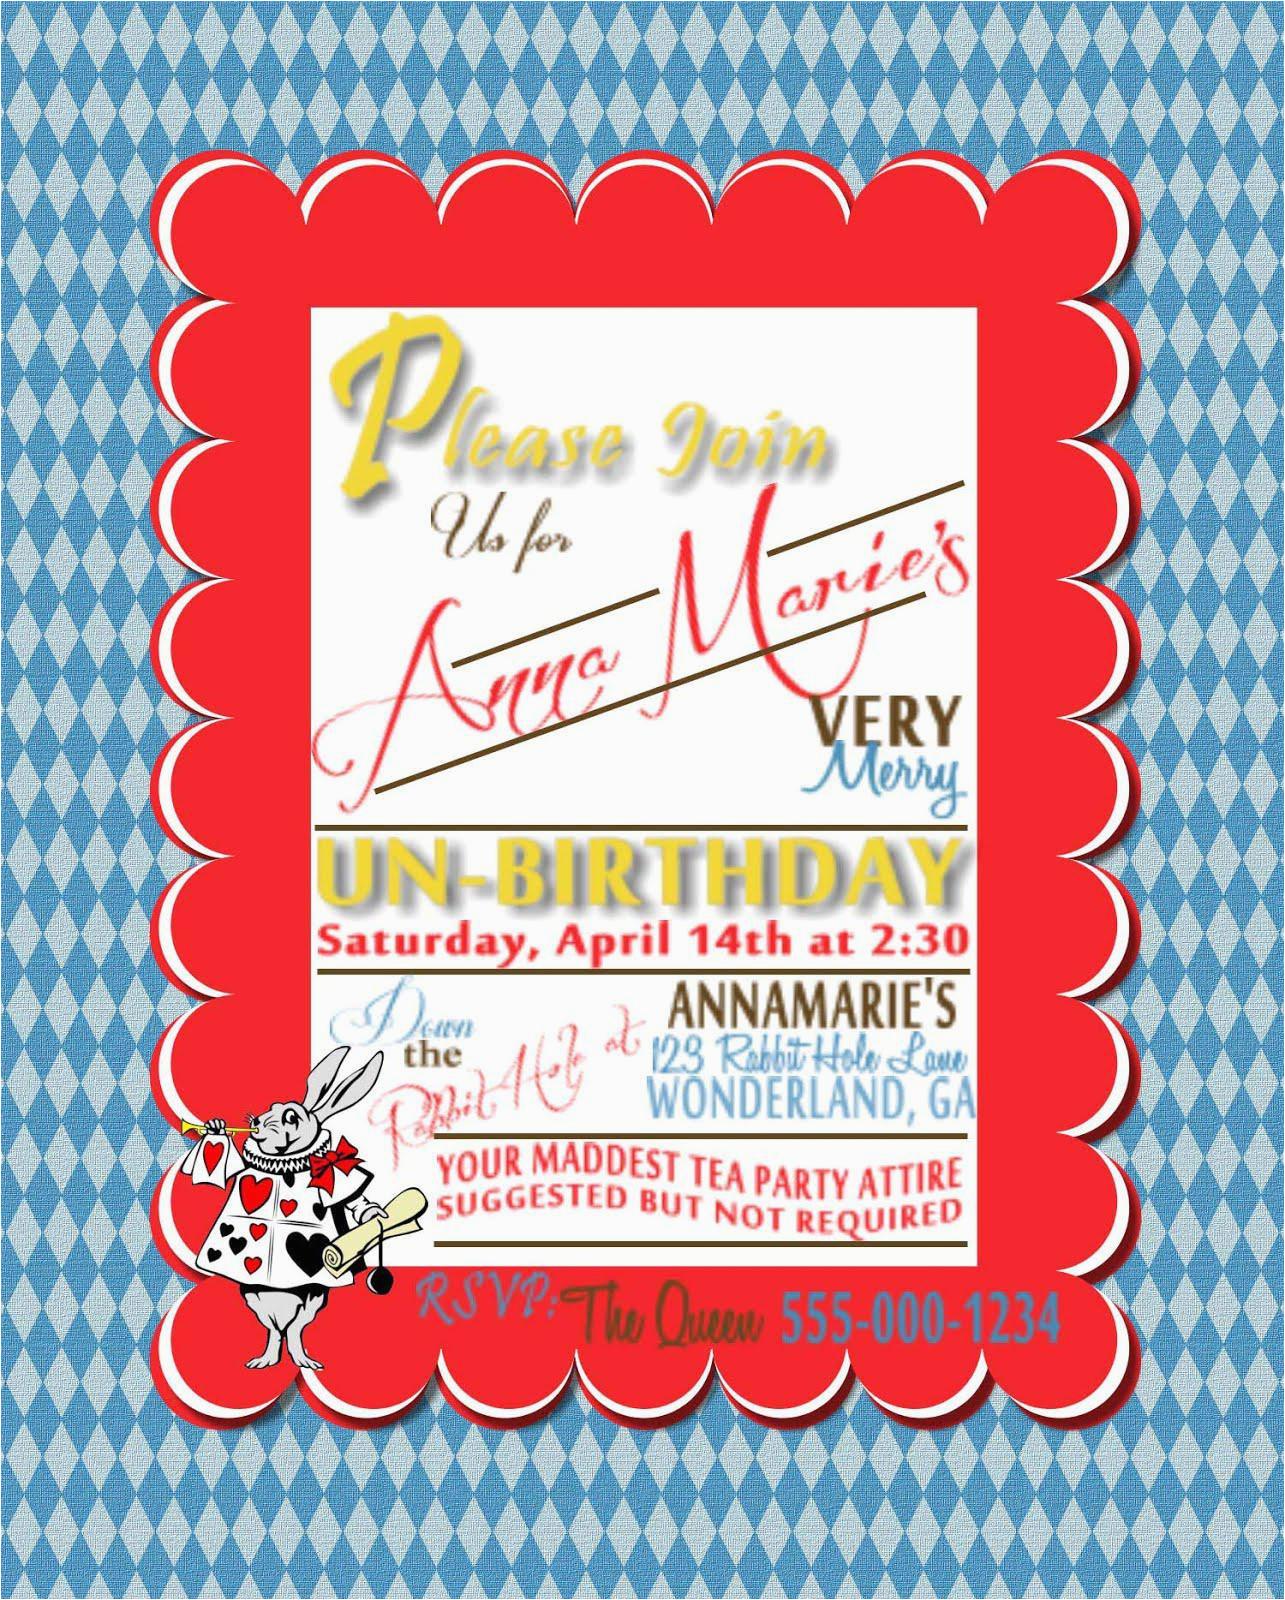 Print Your Own Birthday Invitations Free Make Your Own Party Invitations Party Invitations Templates